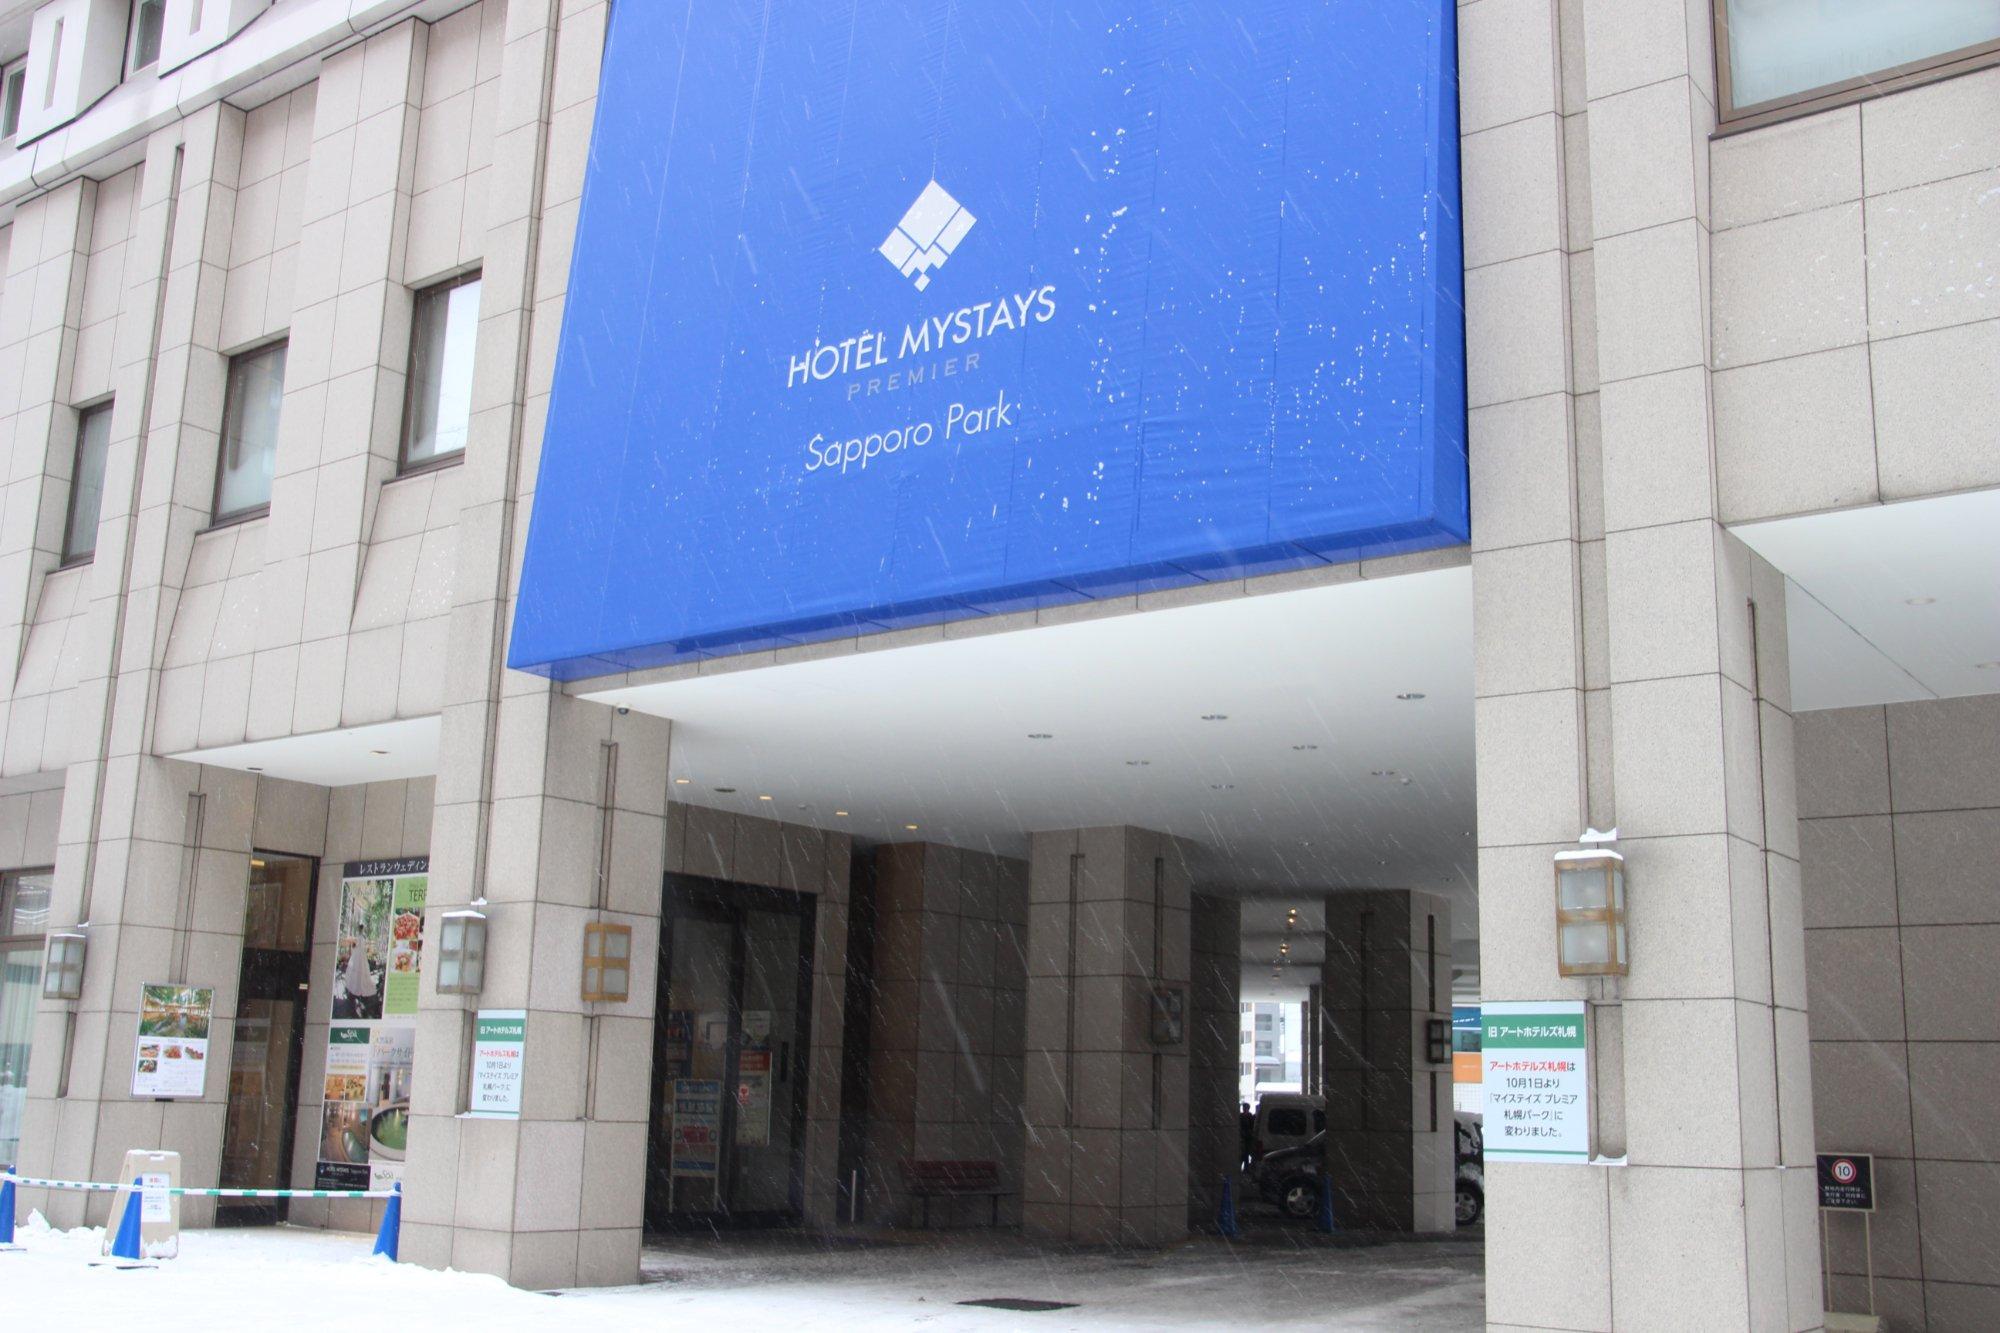 Hotel Mystays Premier Sapporo Park